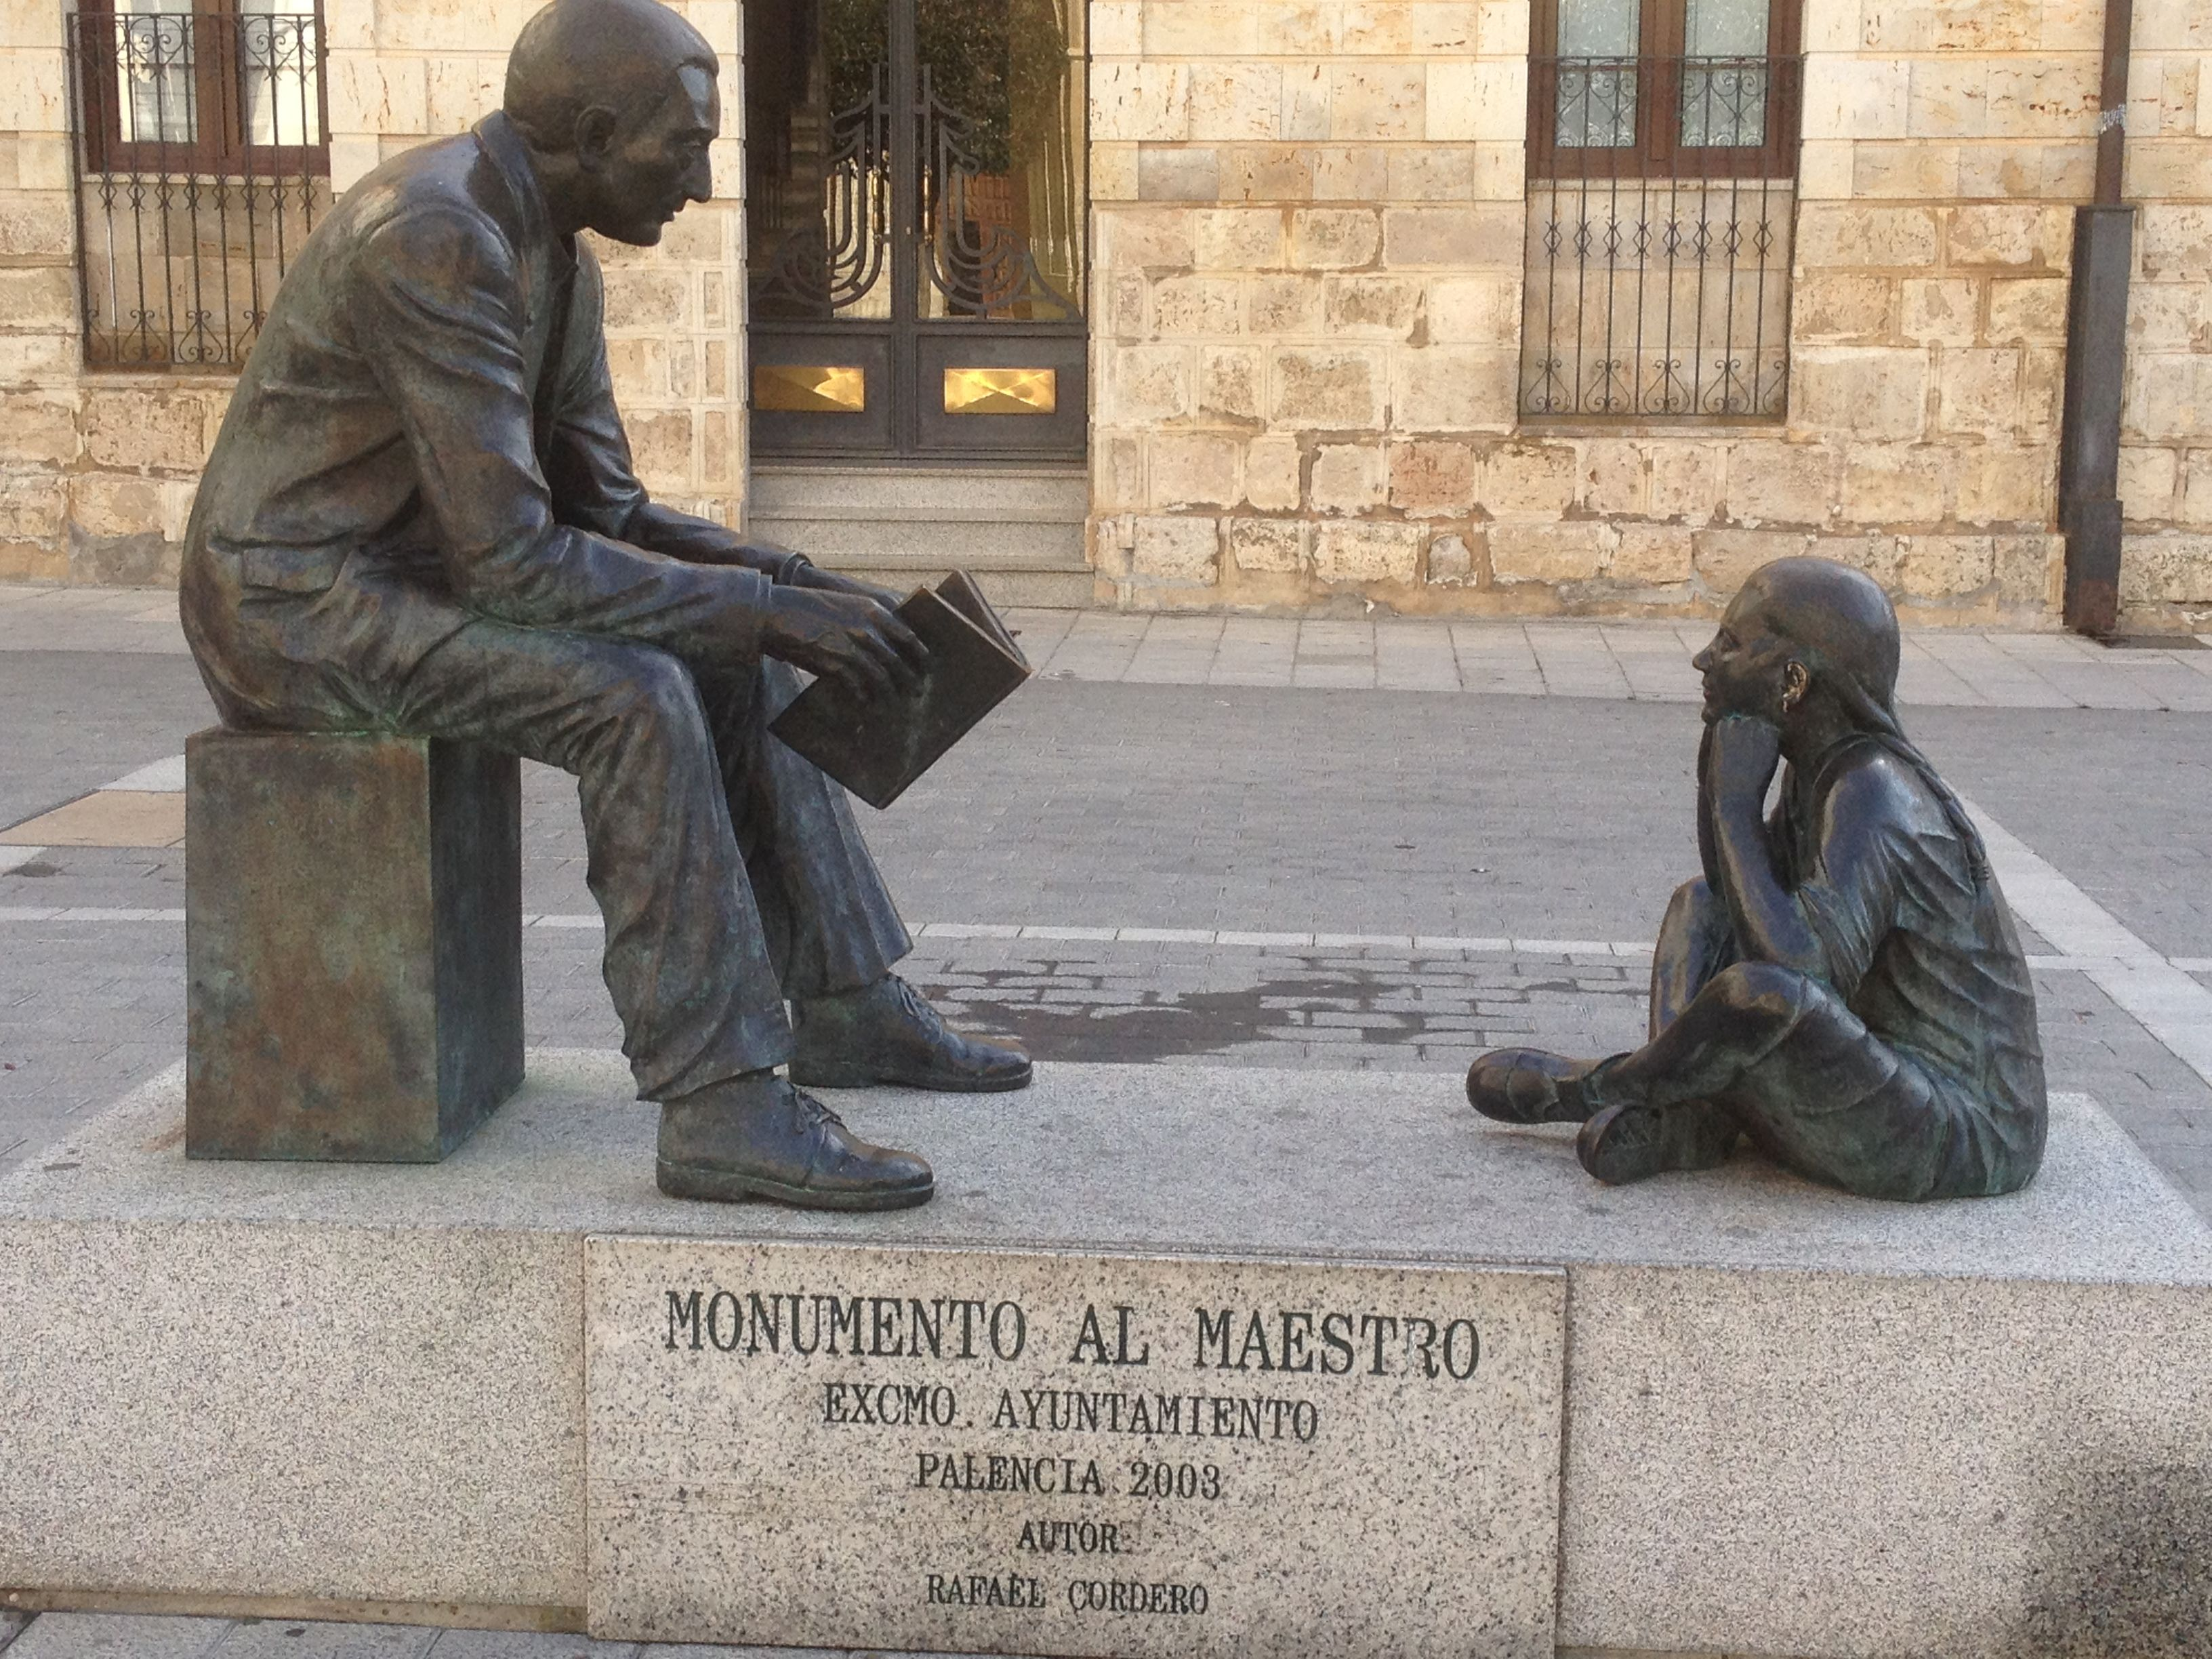 Monumento al maestro. Palencia. Ideal para patrimonioparajovenes.com